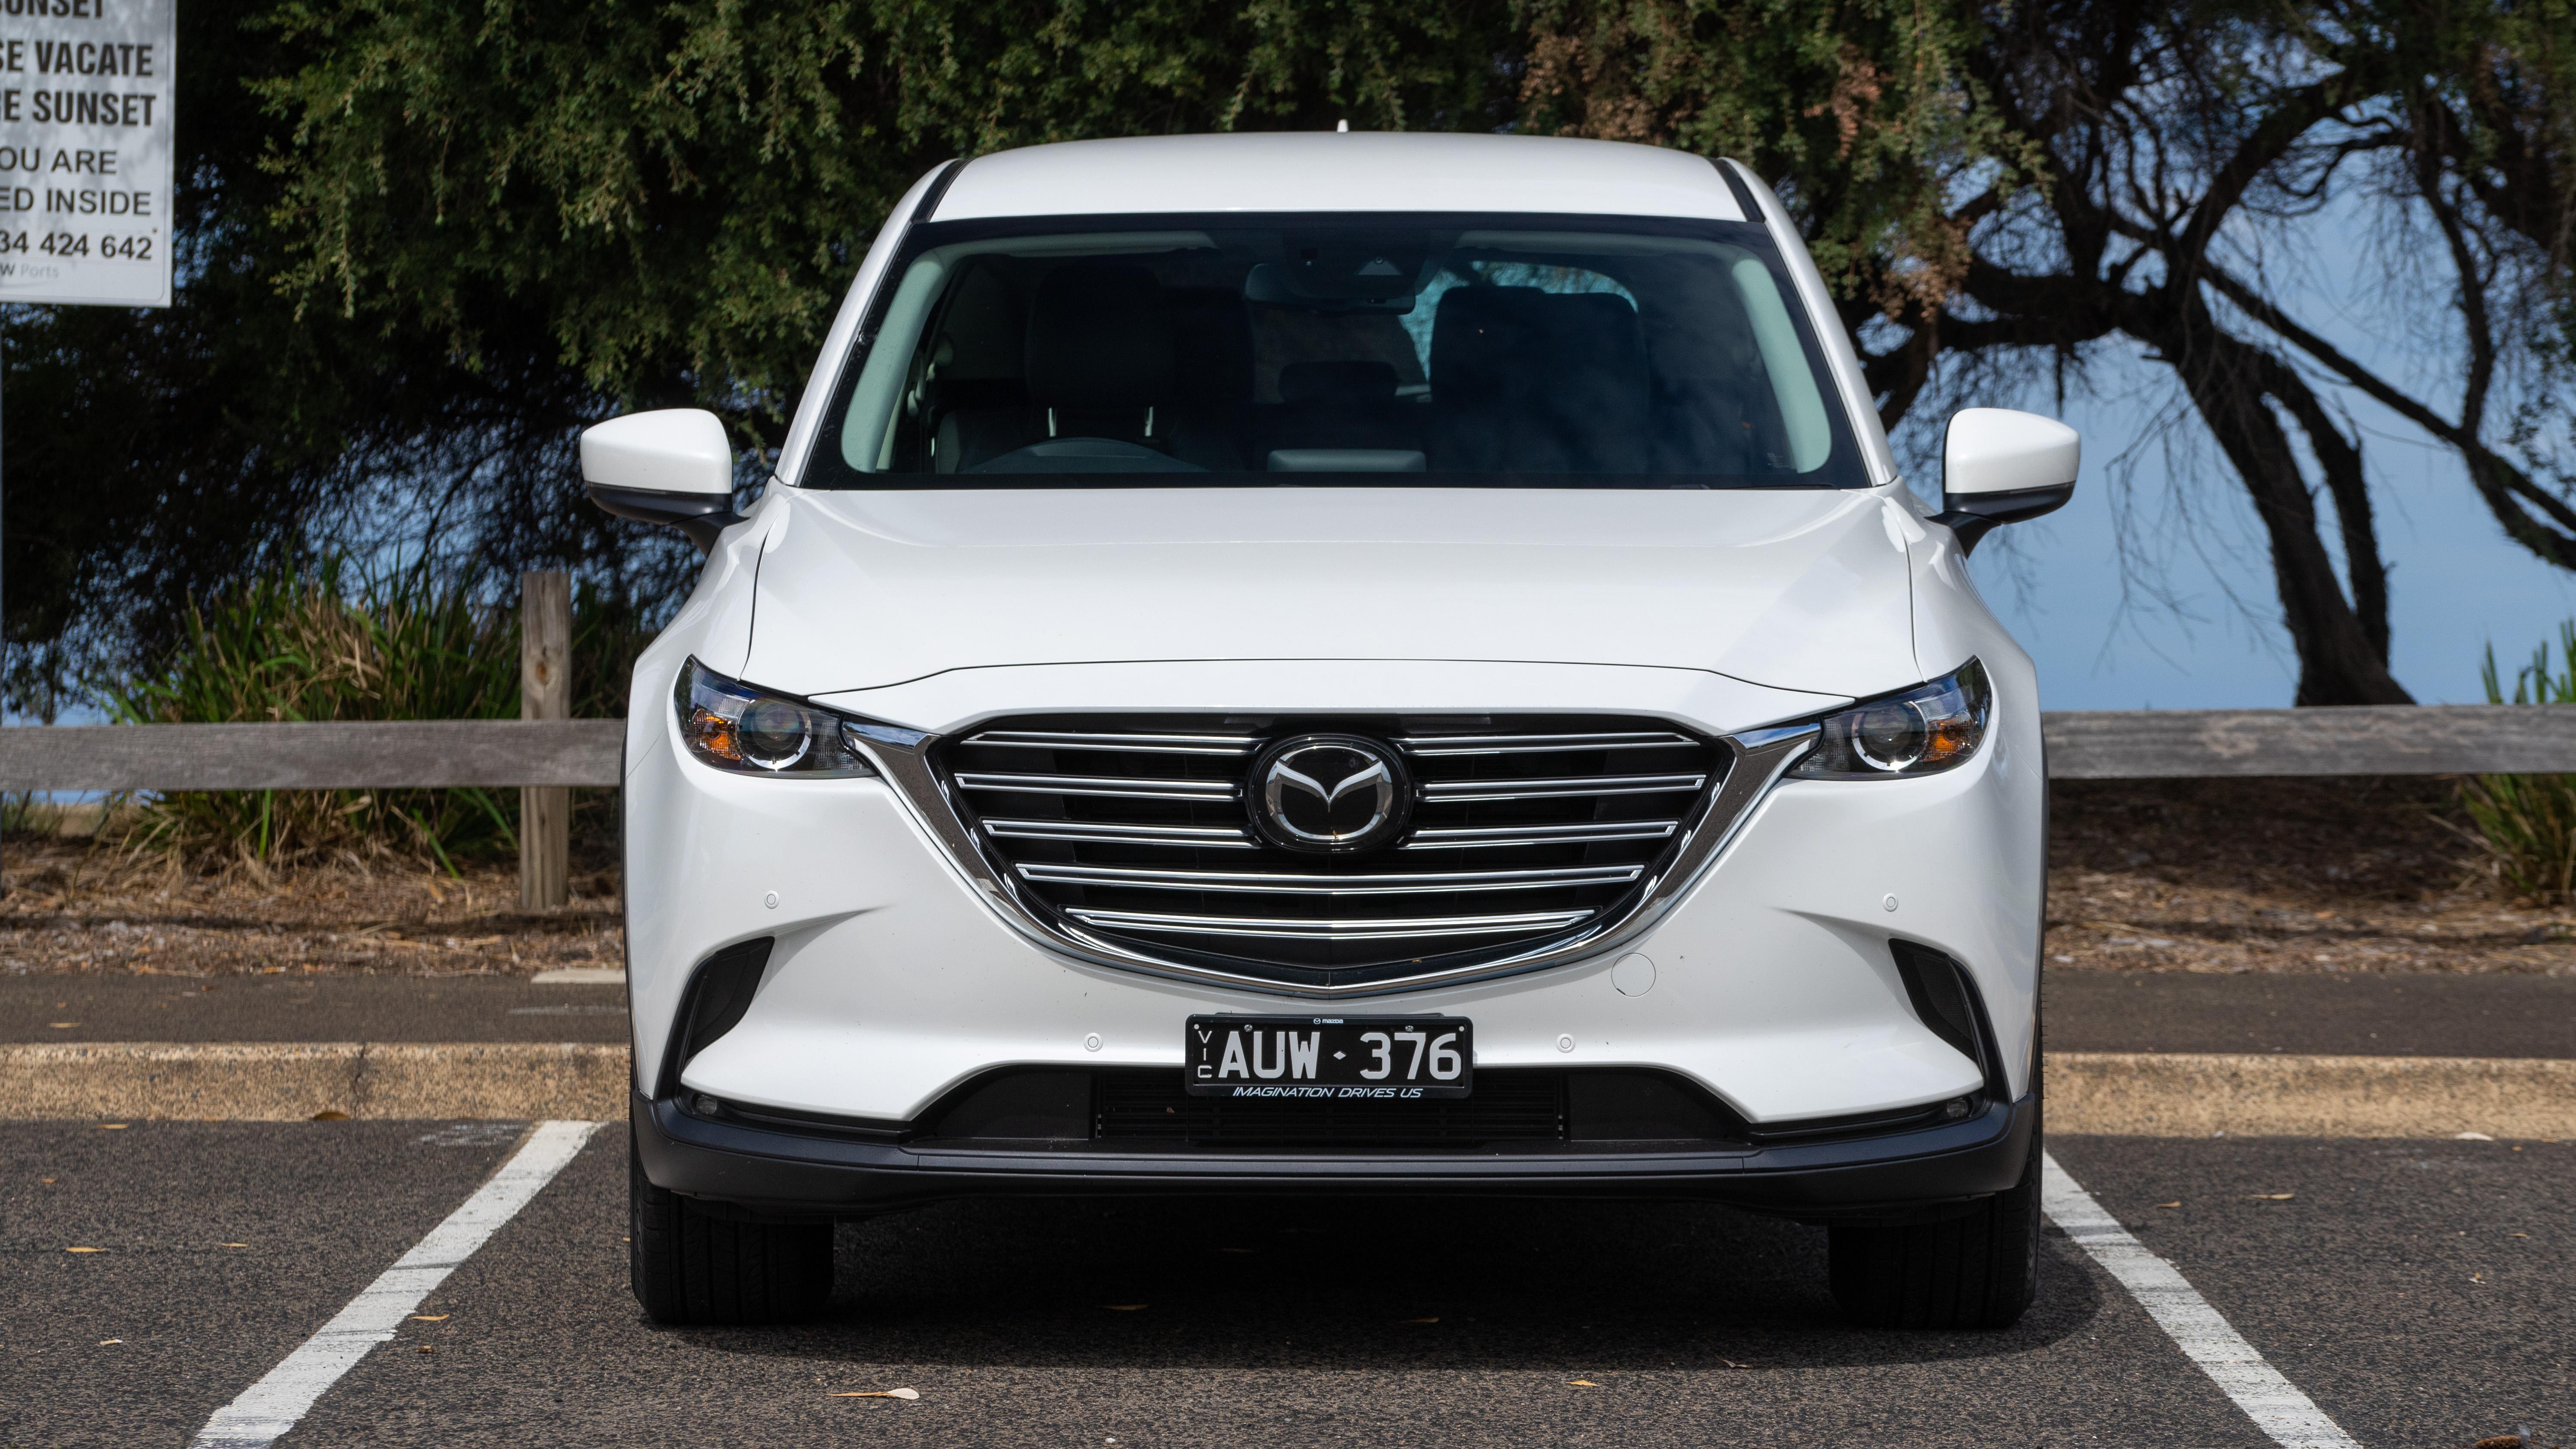 Mazda CX-9 Touring 2019 Wagon Review